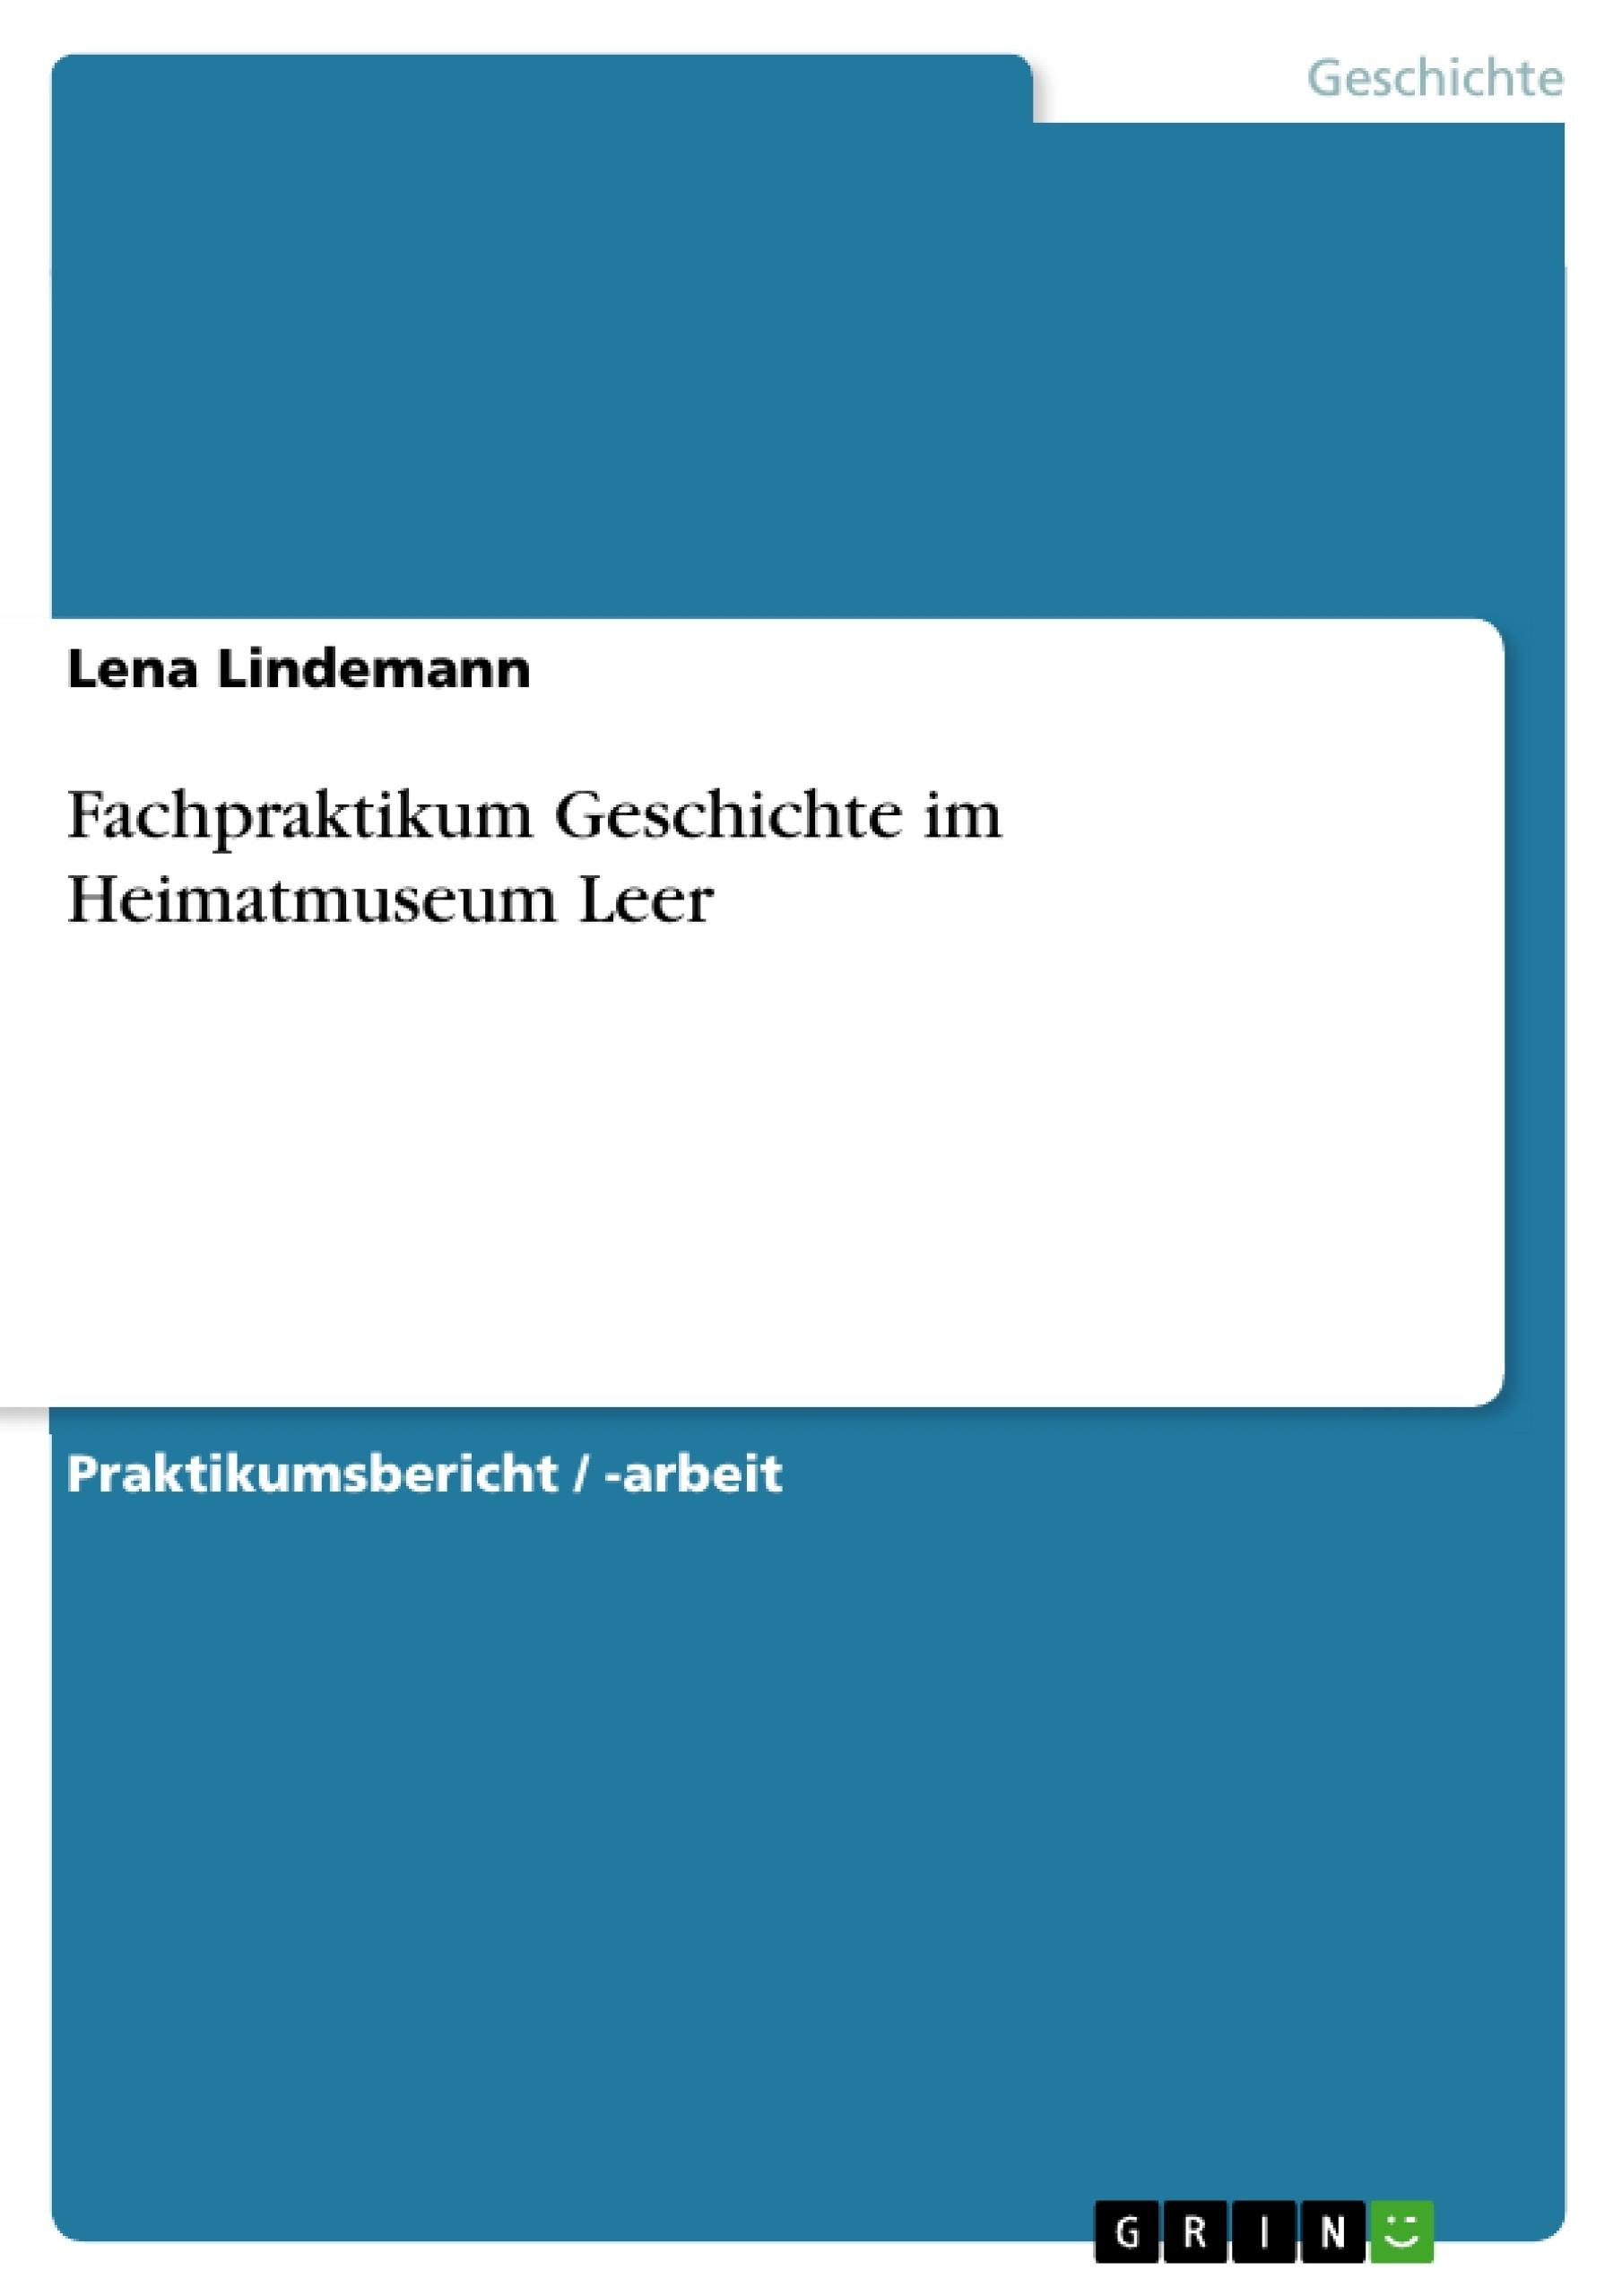 Titel: Fachpraktikum Geschichte im Heimatmuseum Leer